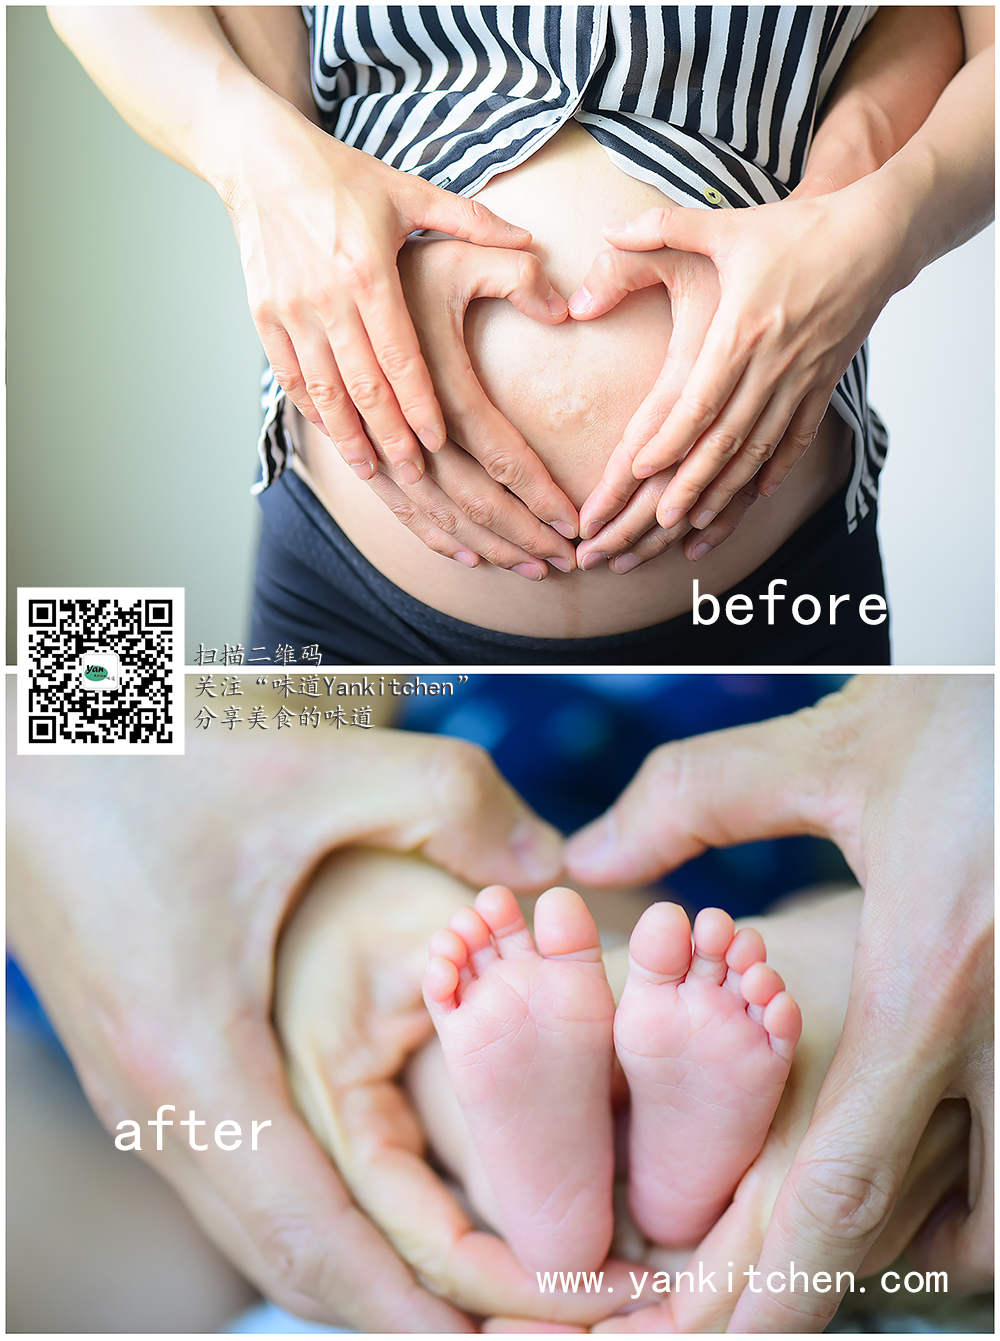 baby photo heart shape 2 copy.jpg